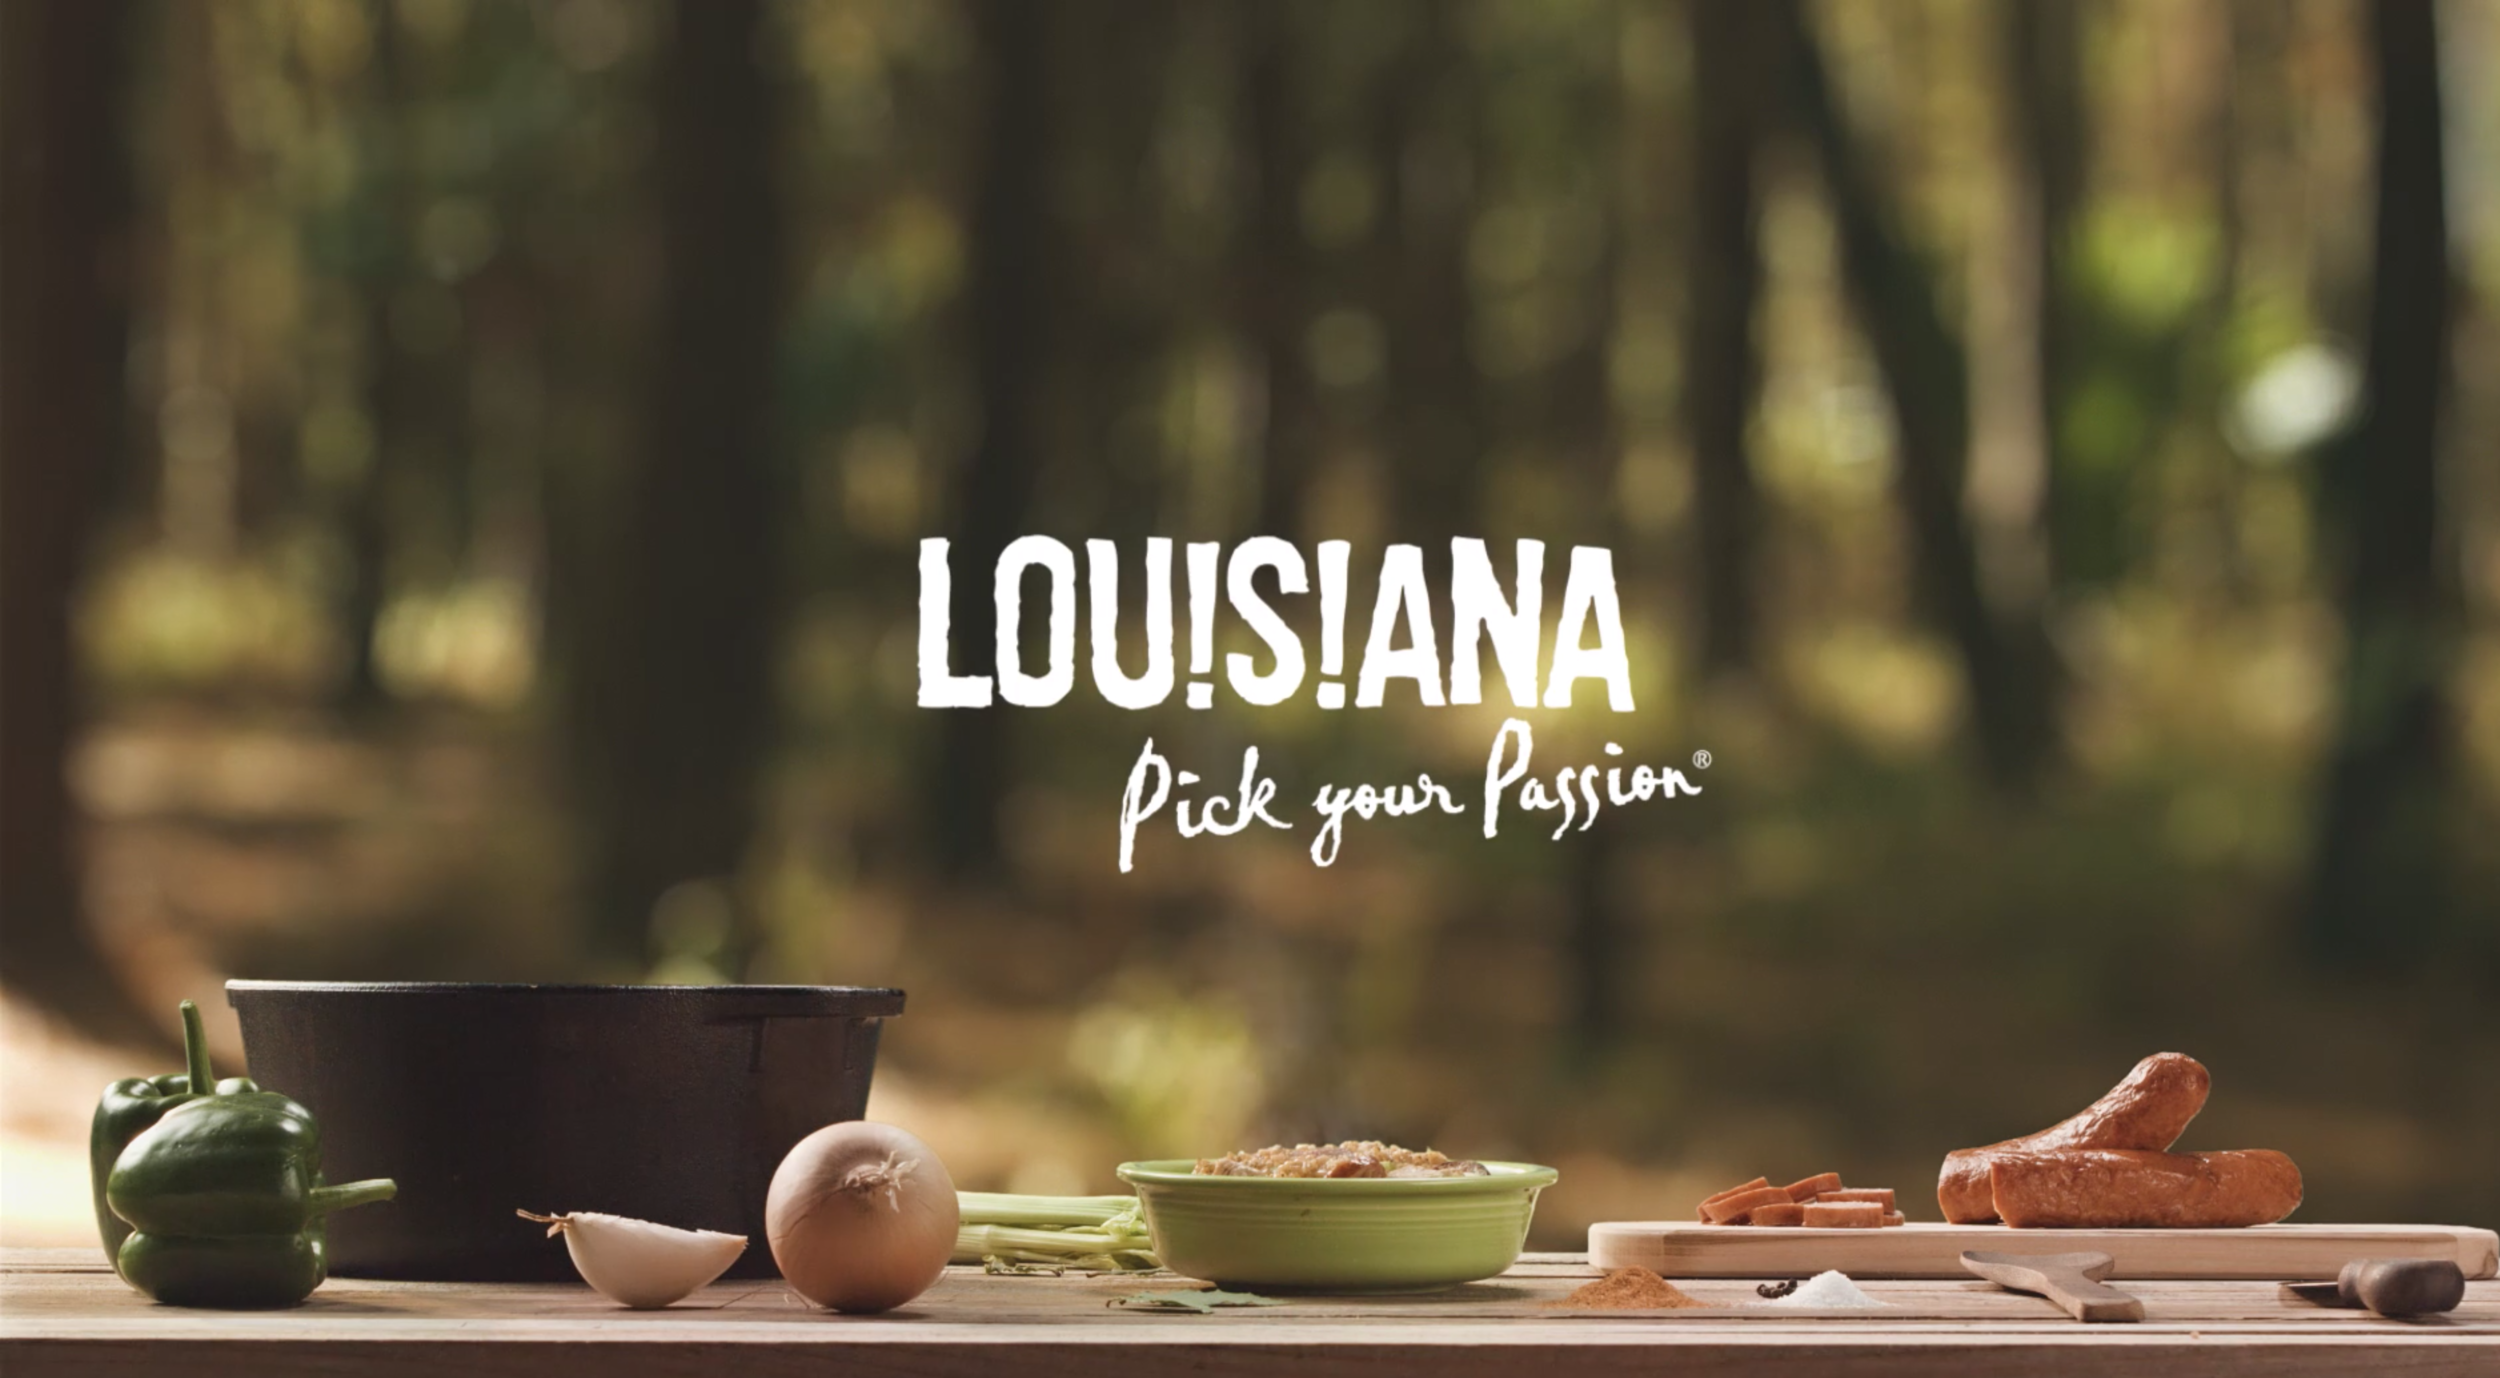 Louisiana Recipes End Card